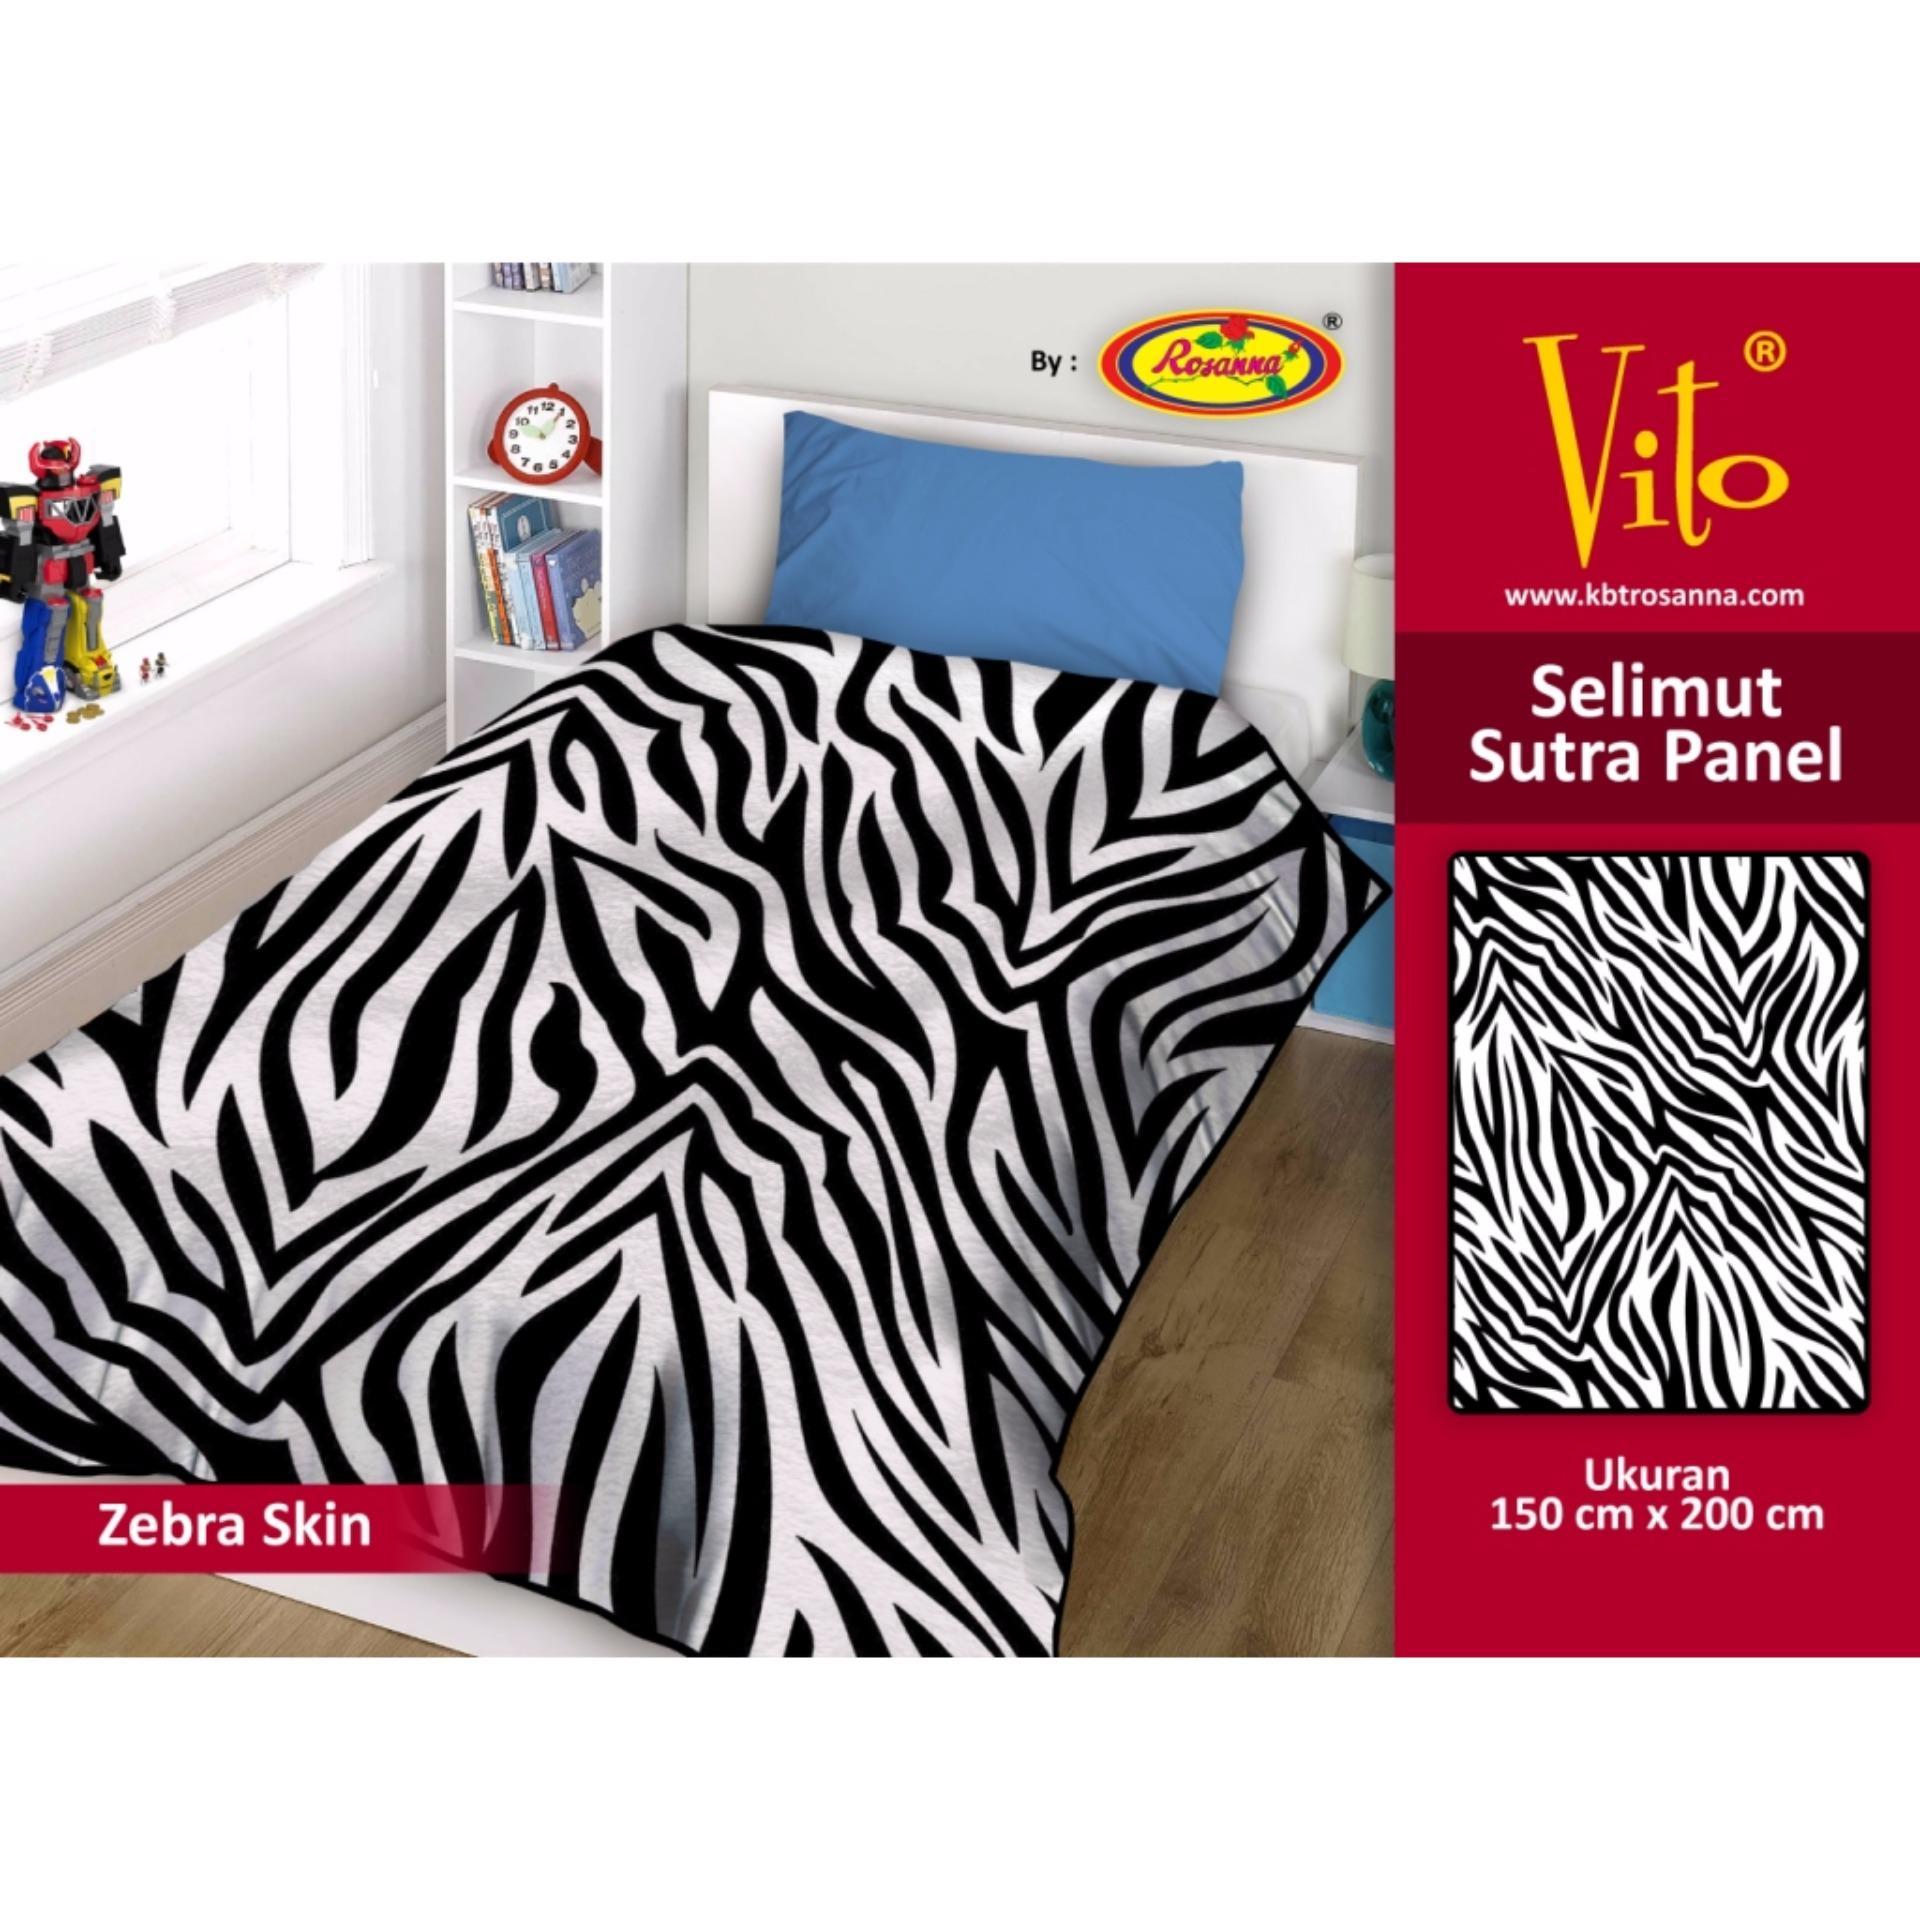 Jual Selimut Vito Sutra Panel 150X200 Zebra Skin Indonesia Murah